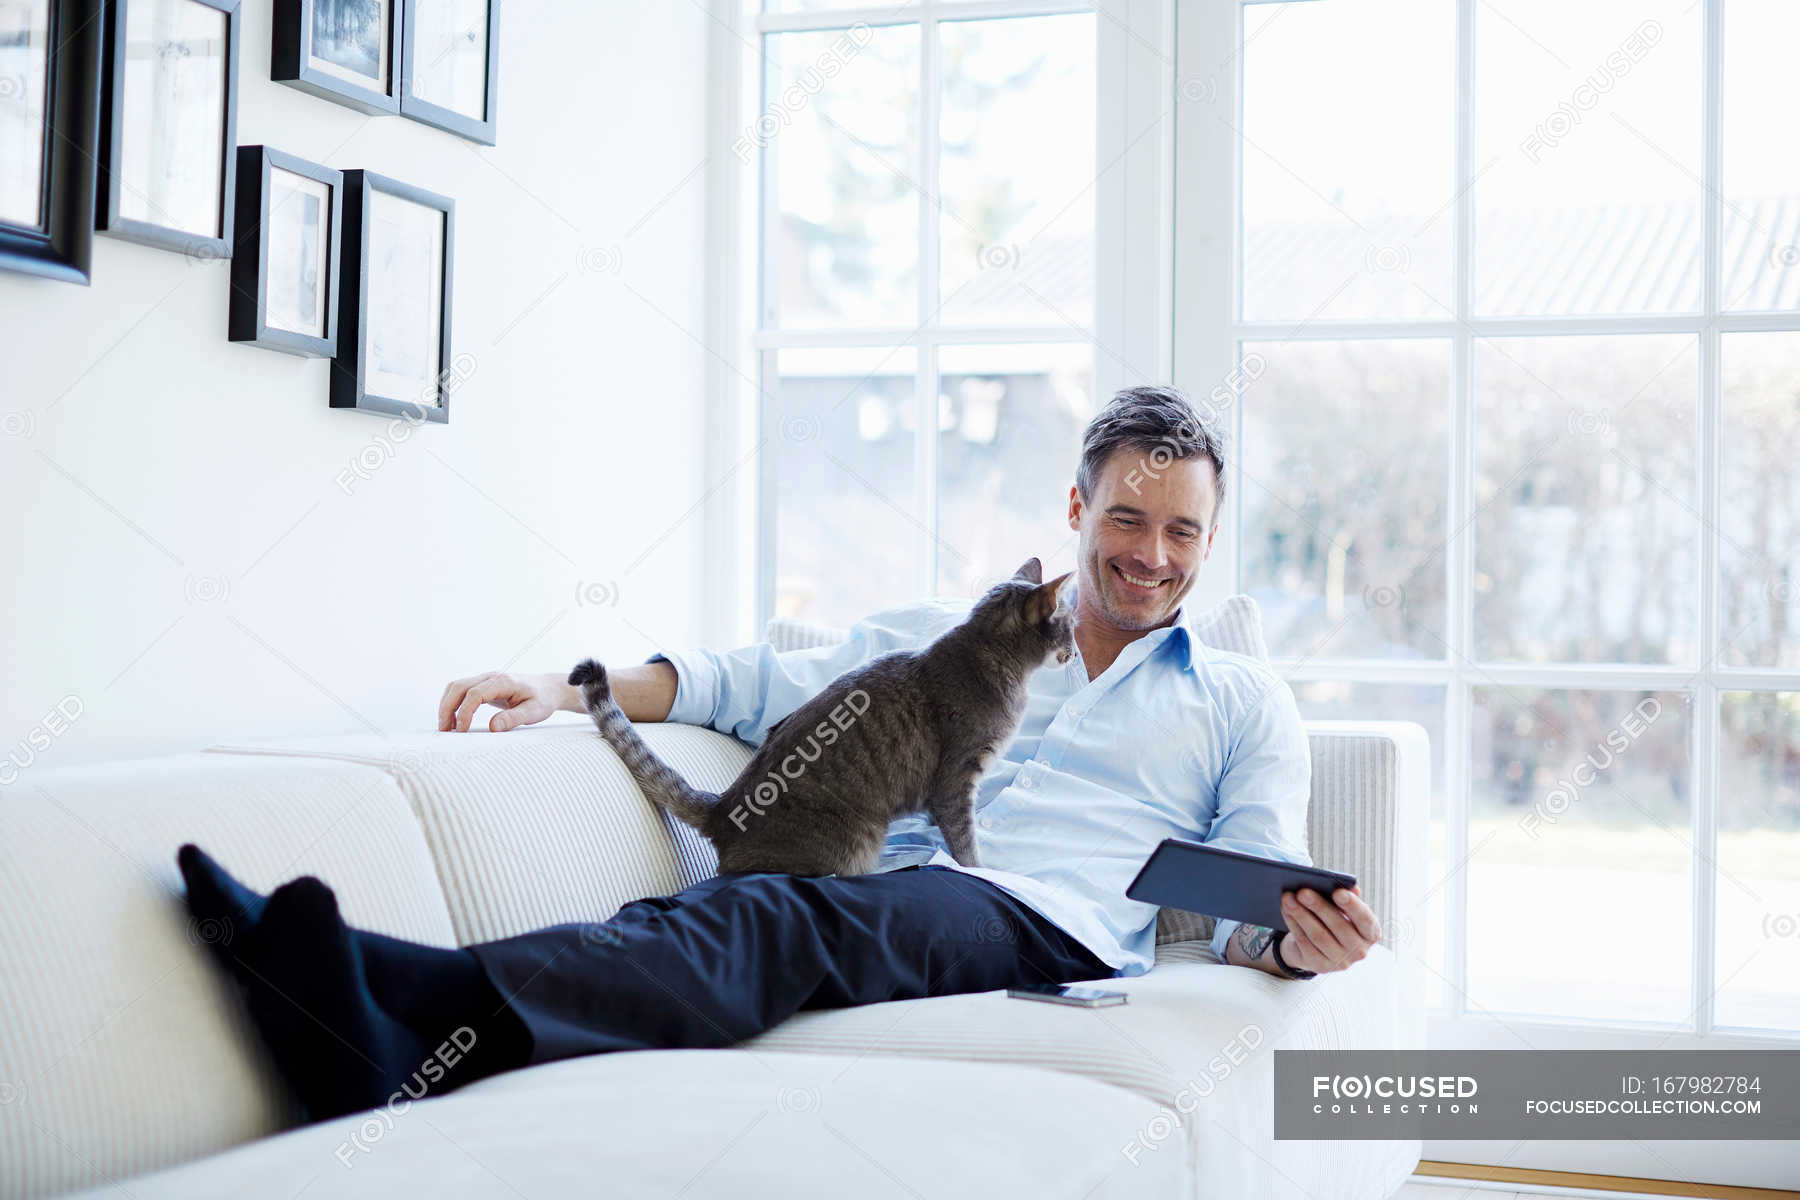 Man Relaxing On Sofa Using Digital